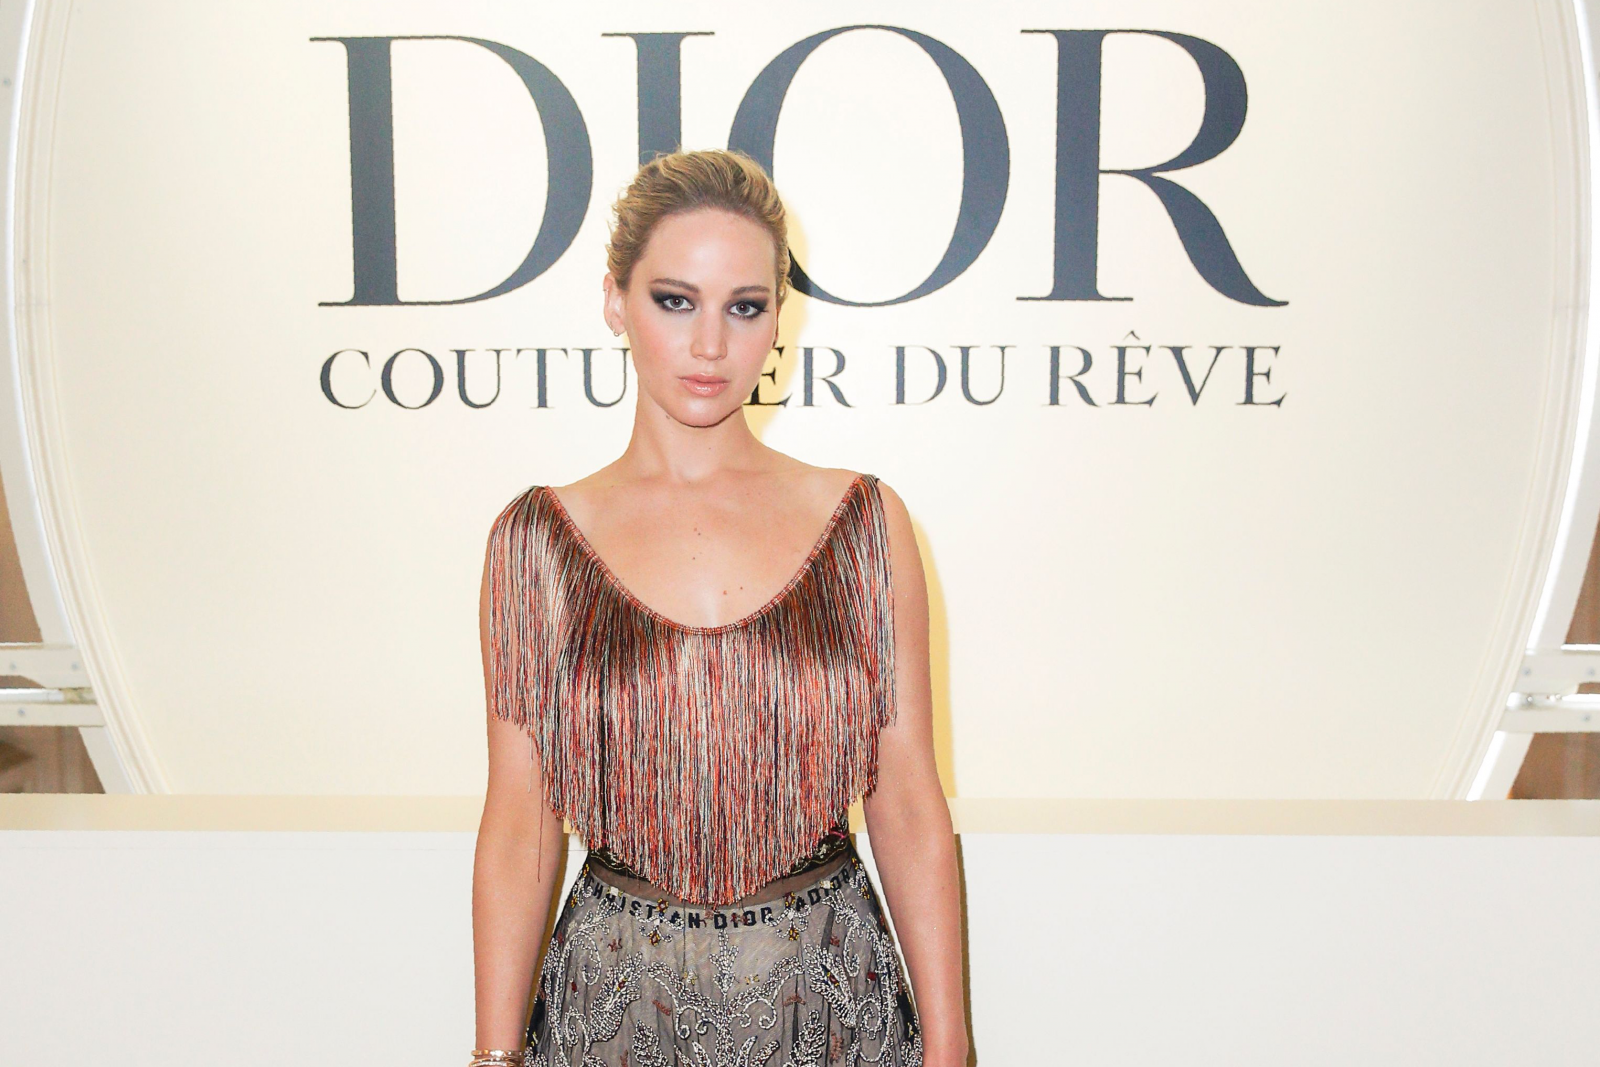 Braless Jennifer Lawrence suffers wardrobe malfunction in see-through dress